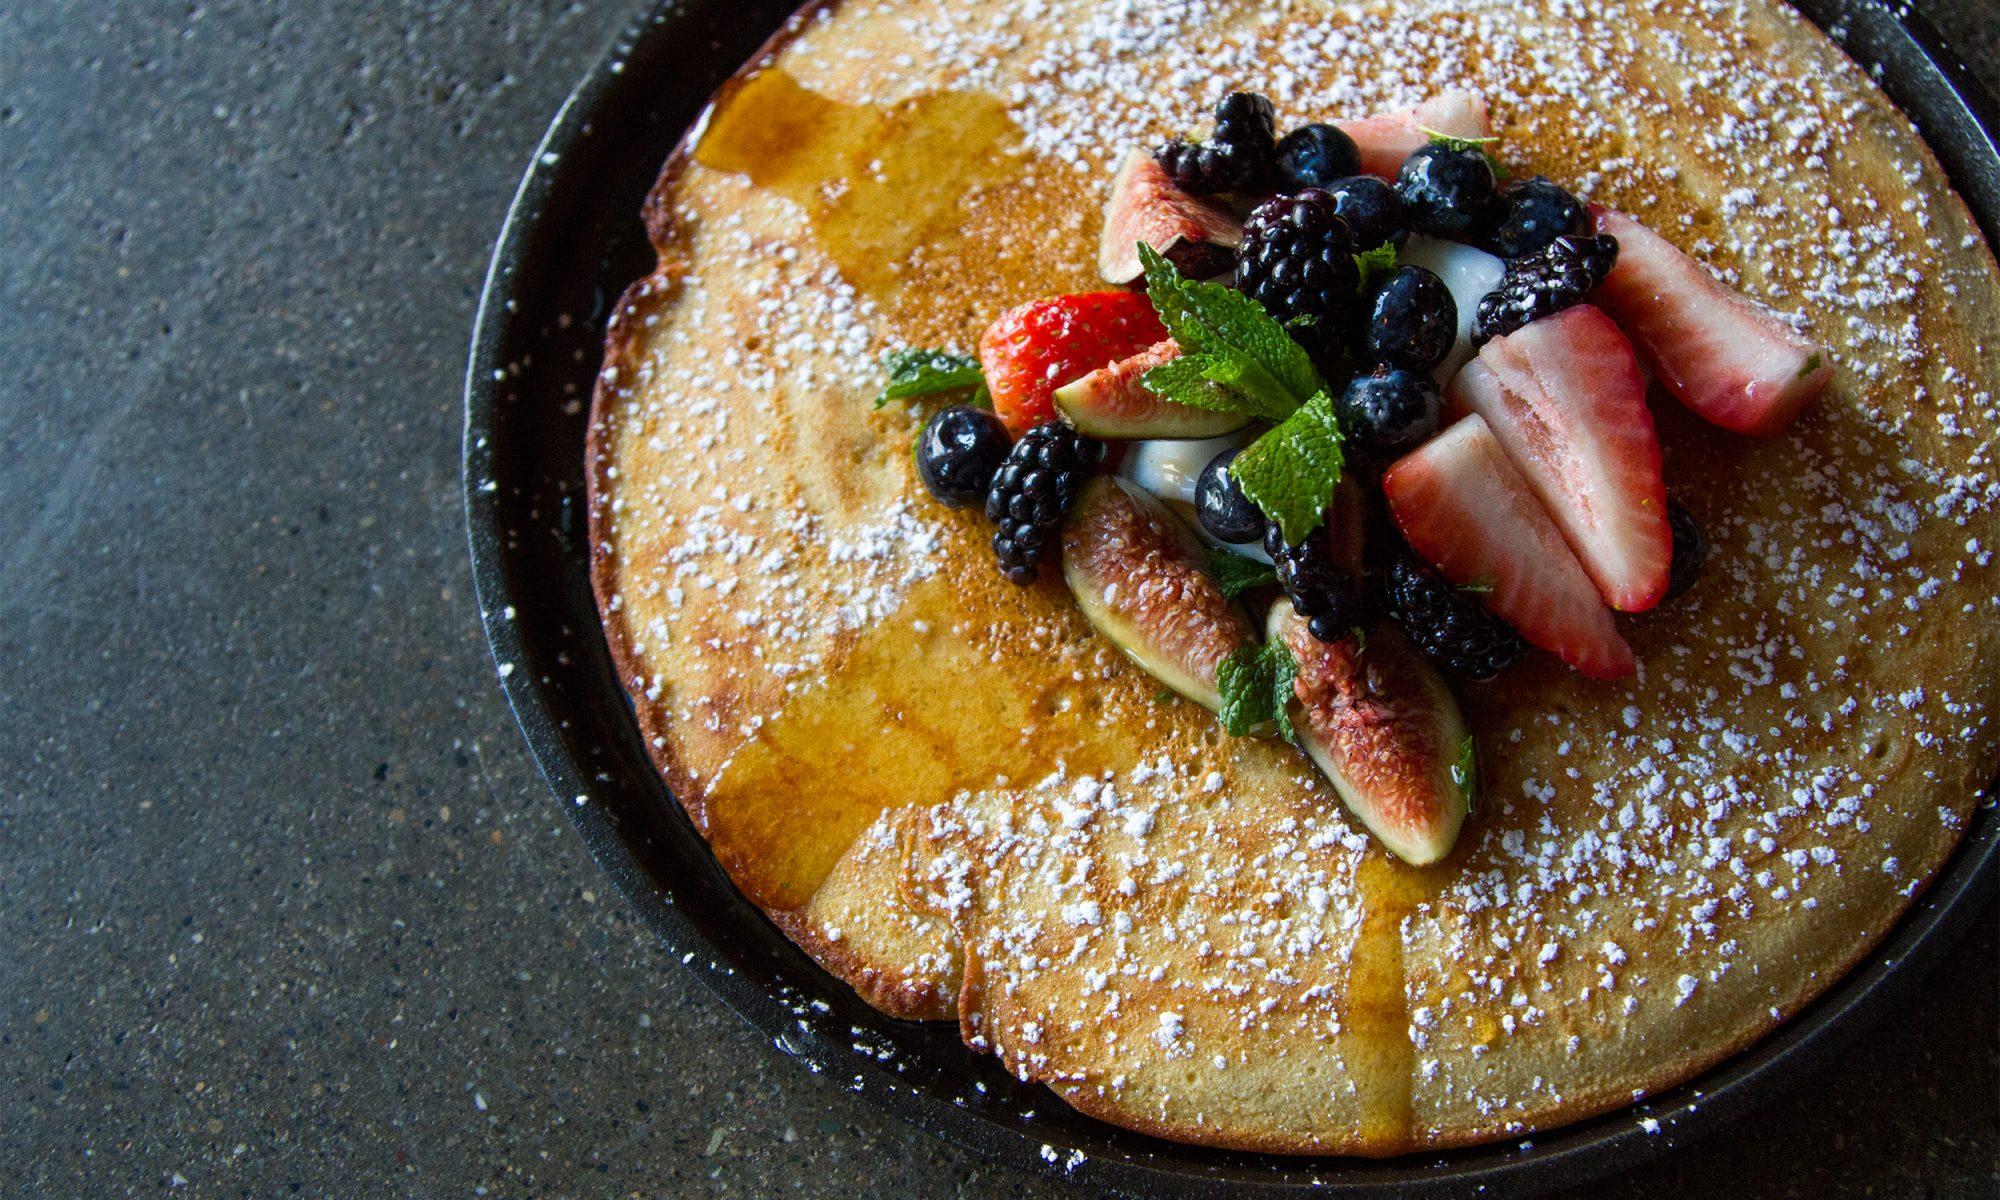 EC: Italian-Style Semolina Pancakes That'll Make Your Nonna Proud